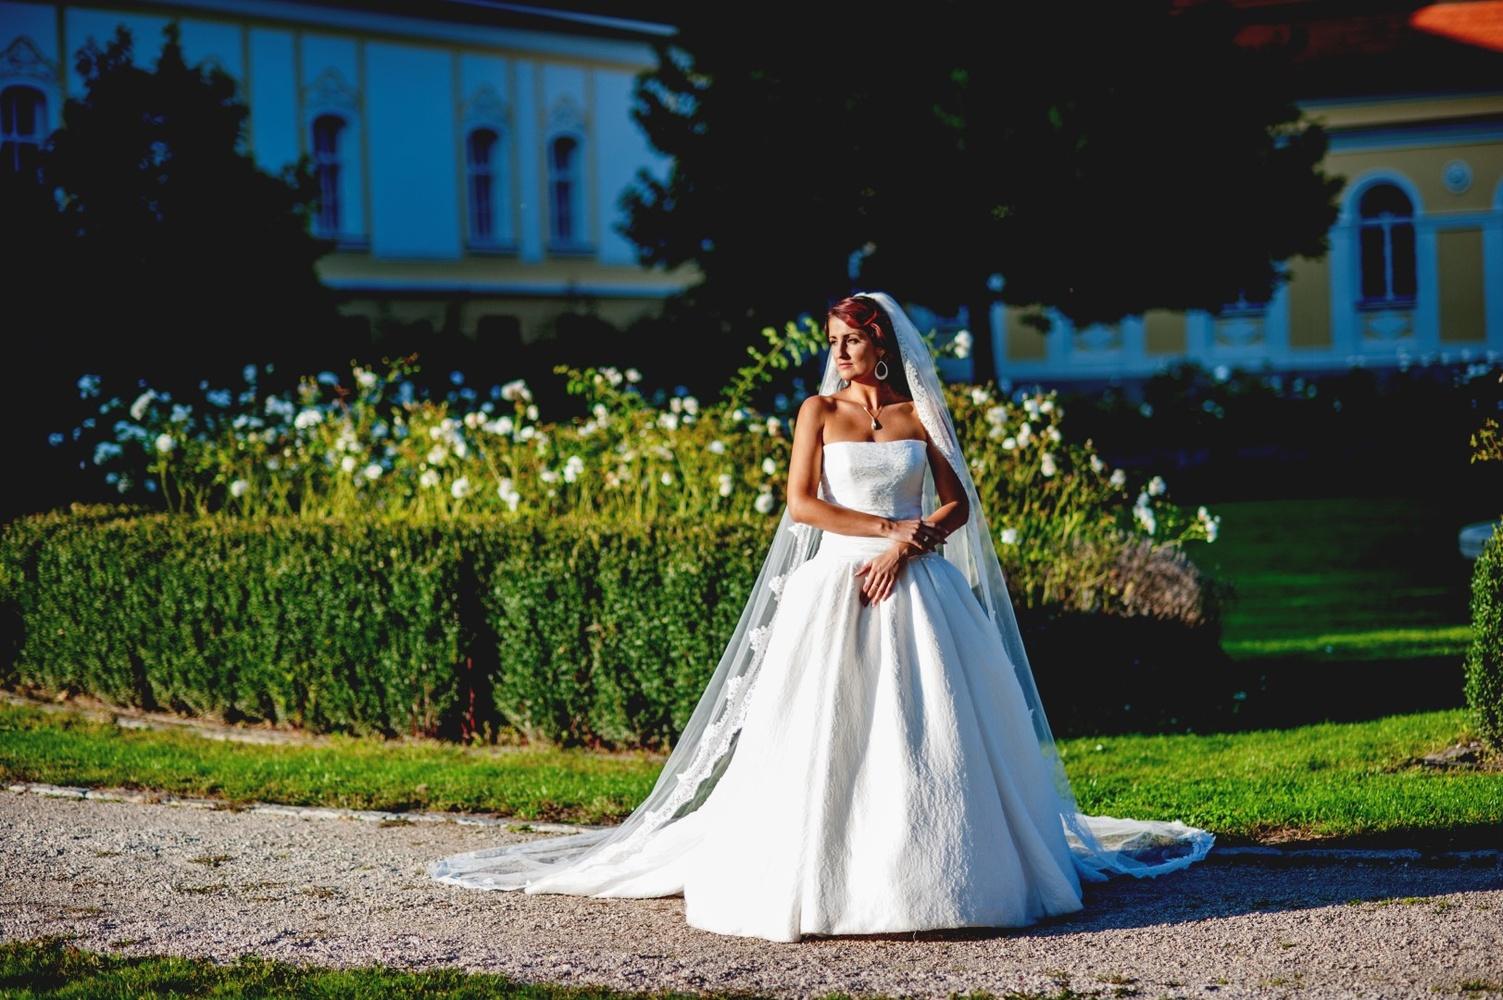 http://www.fotoz.sk/images/gallery-12/normal/svadba_hotel-chateau-bela_224.jpg